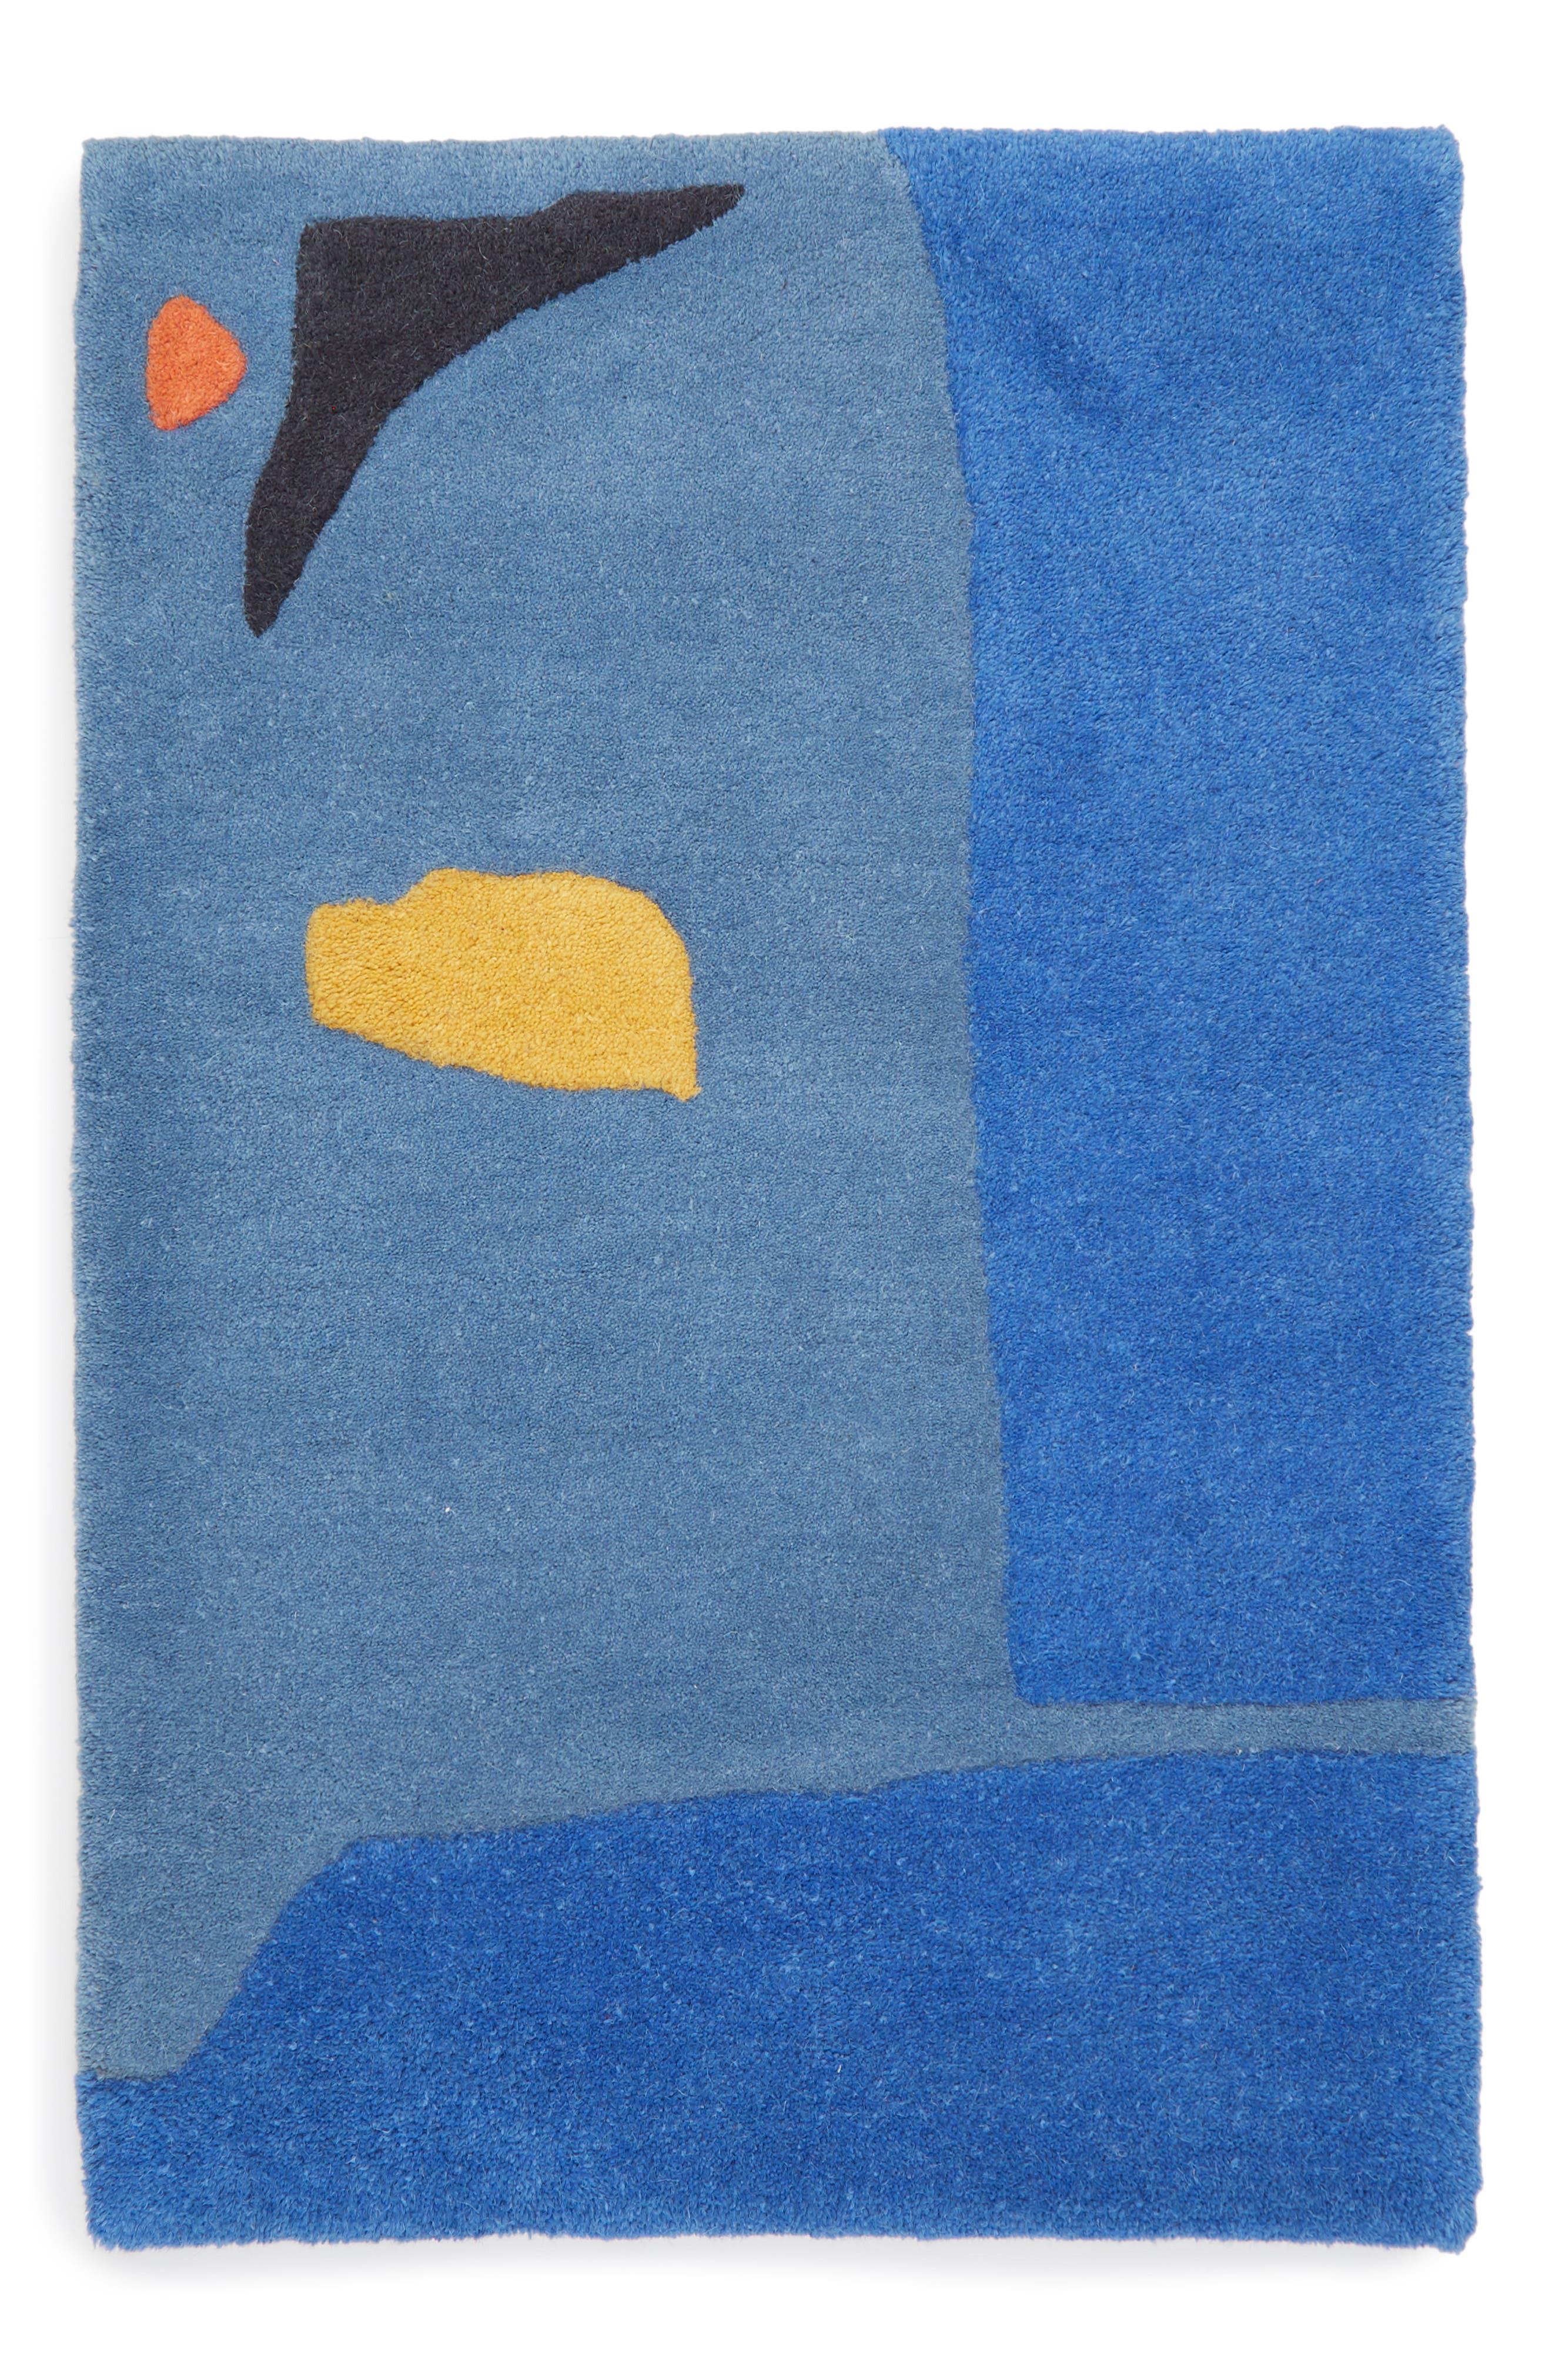 The Little Stranger Hand Tufted Wool Rug,                             Main thumbnail 1, color,                             BLUE